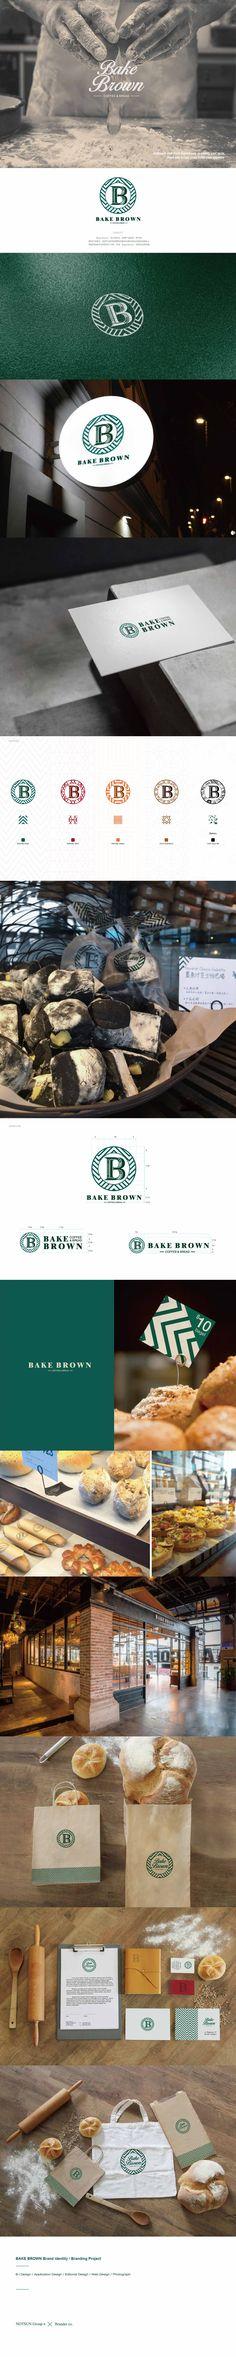 BAKE BROWN